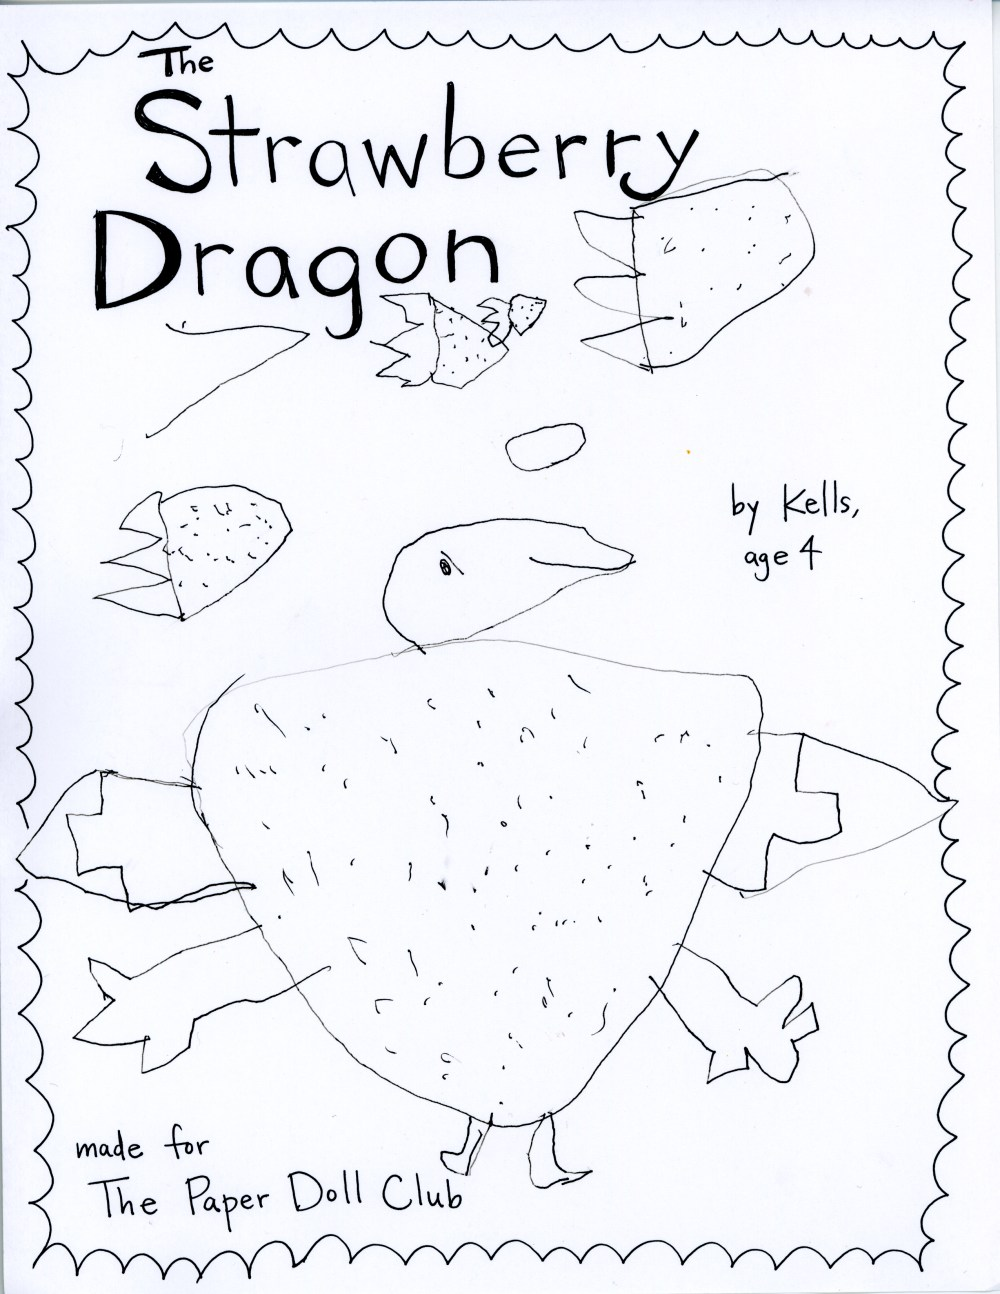 Strawberry Dragon jpg